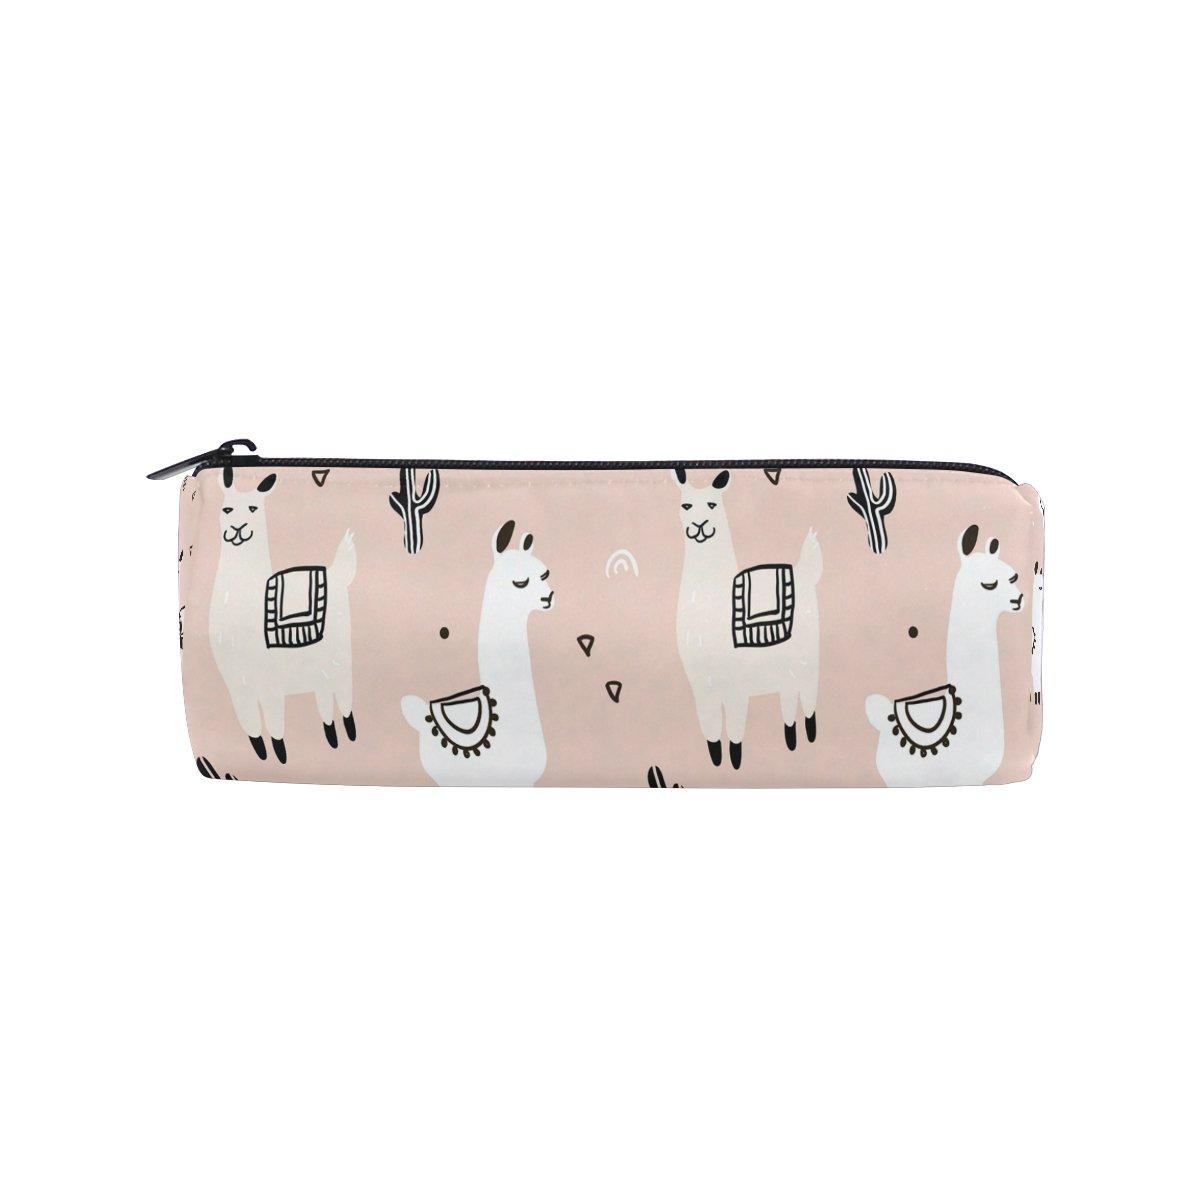 KUWT Pencil Bag Cute Cactus Alpaca Llama, Pencil Case Pen Zipper Bag Pouch Holder Makeup Brush Bag for School Work Office